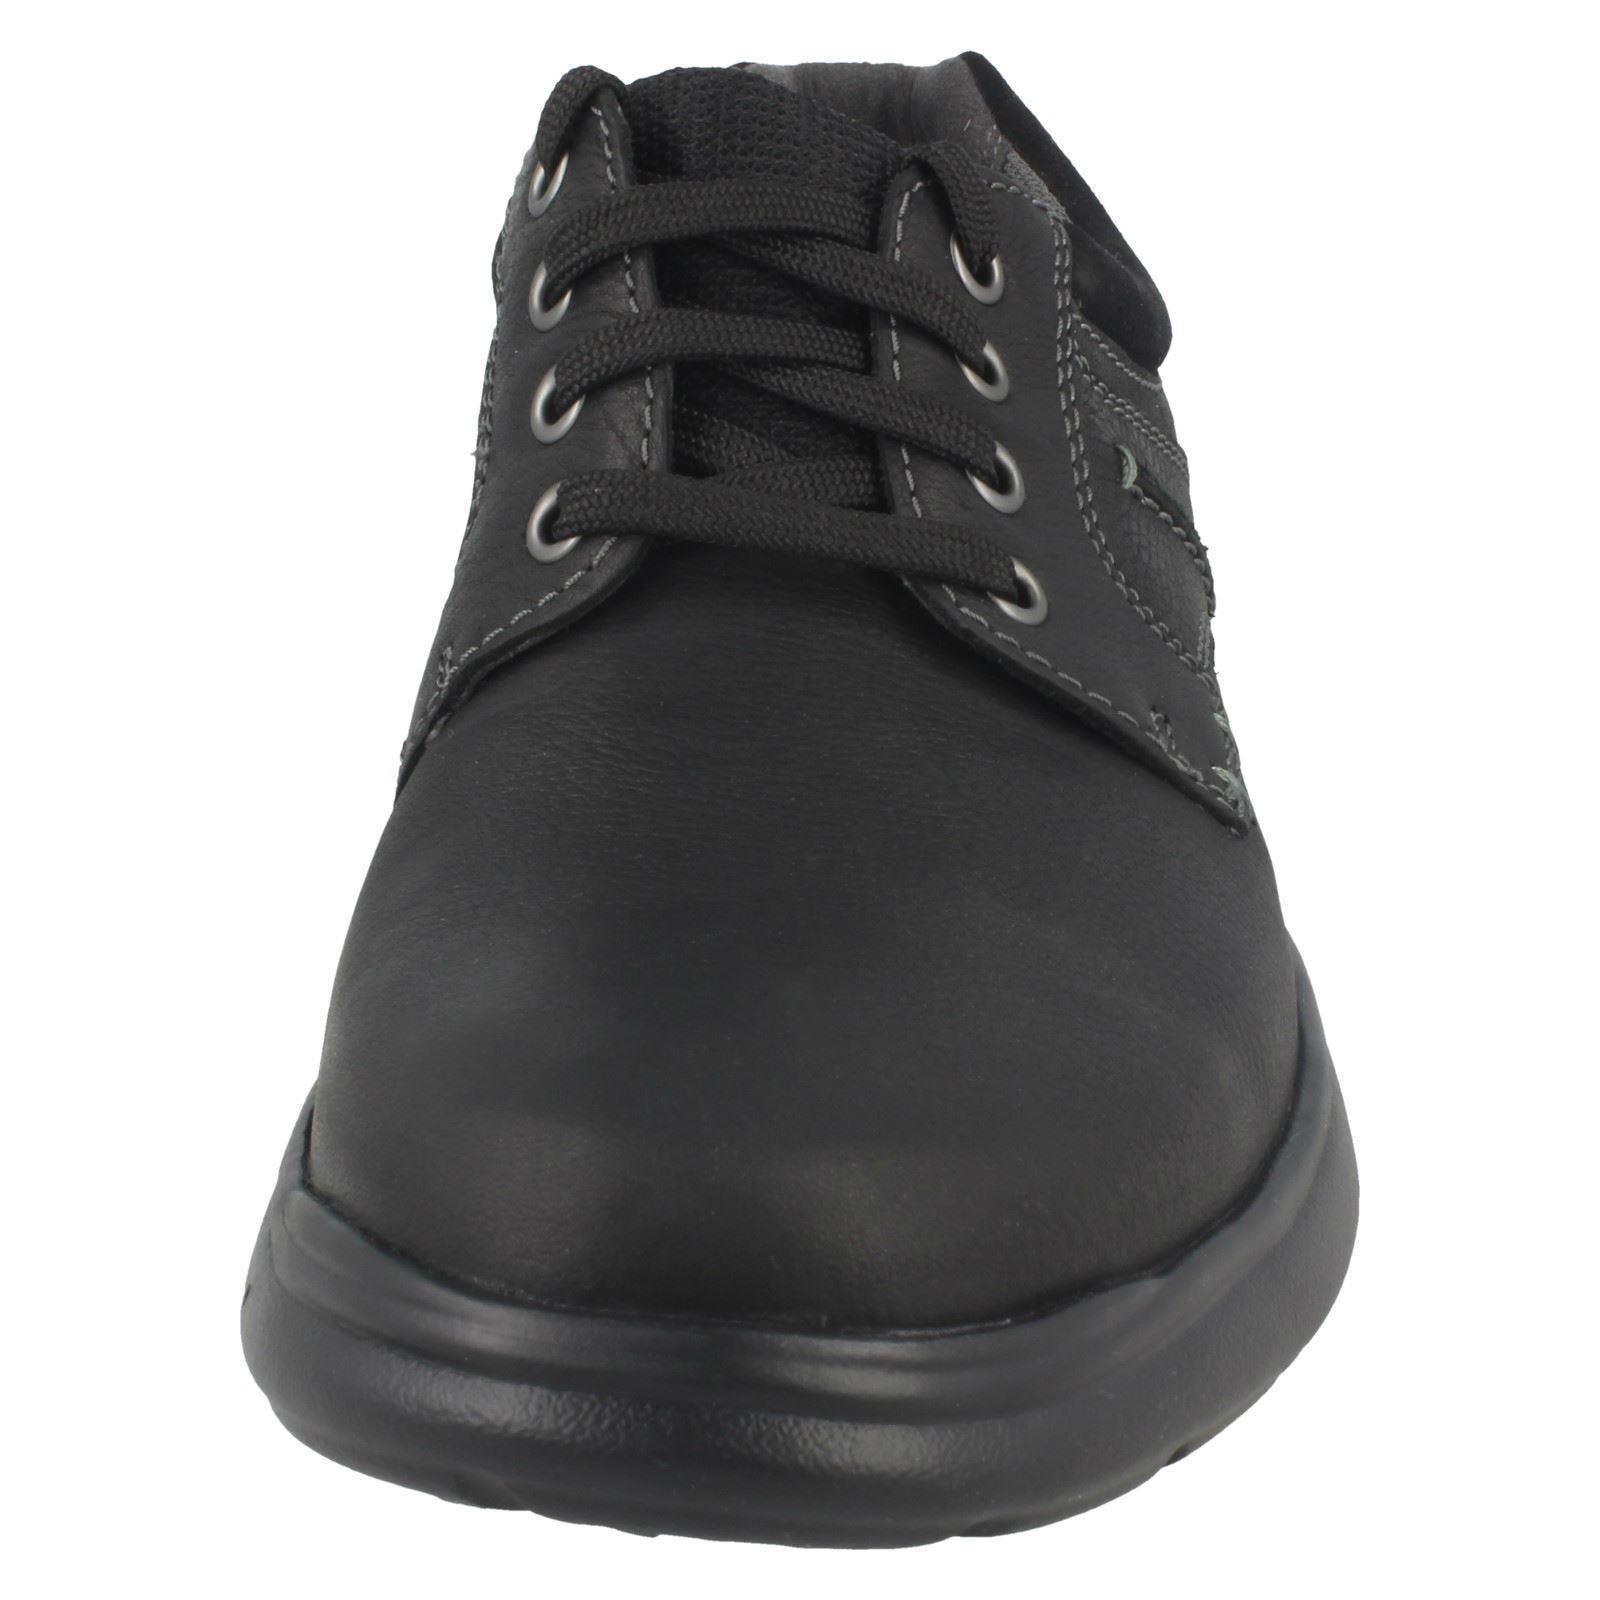 Clarks Cotrell Oben Einfarbig Herren Leder Spitze Oben Cotrell Schuhe 7d2247